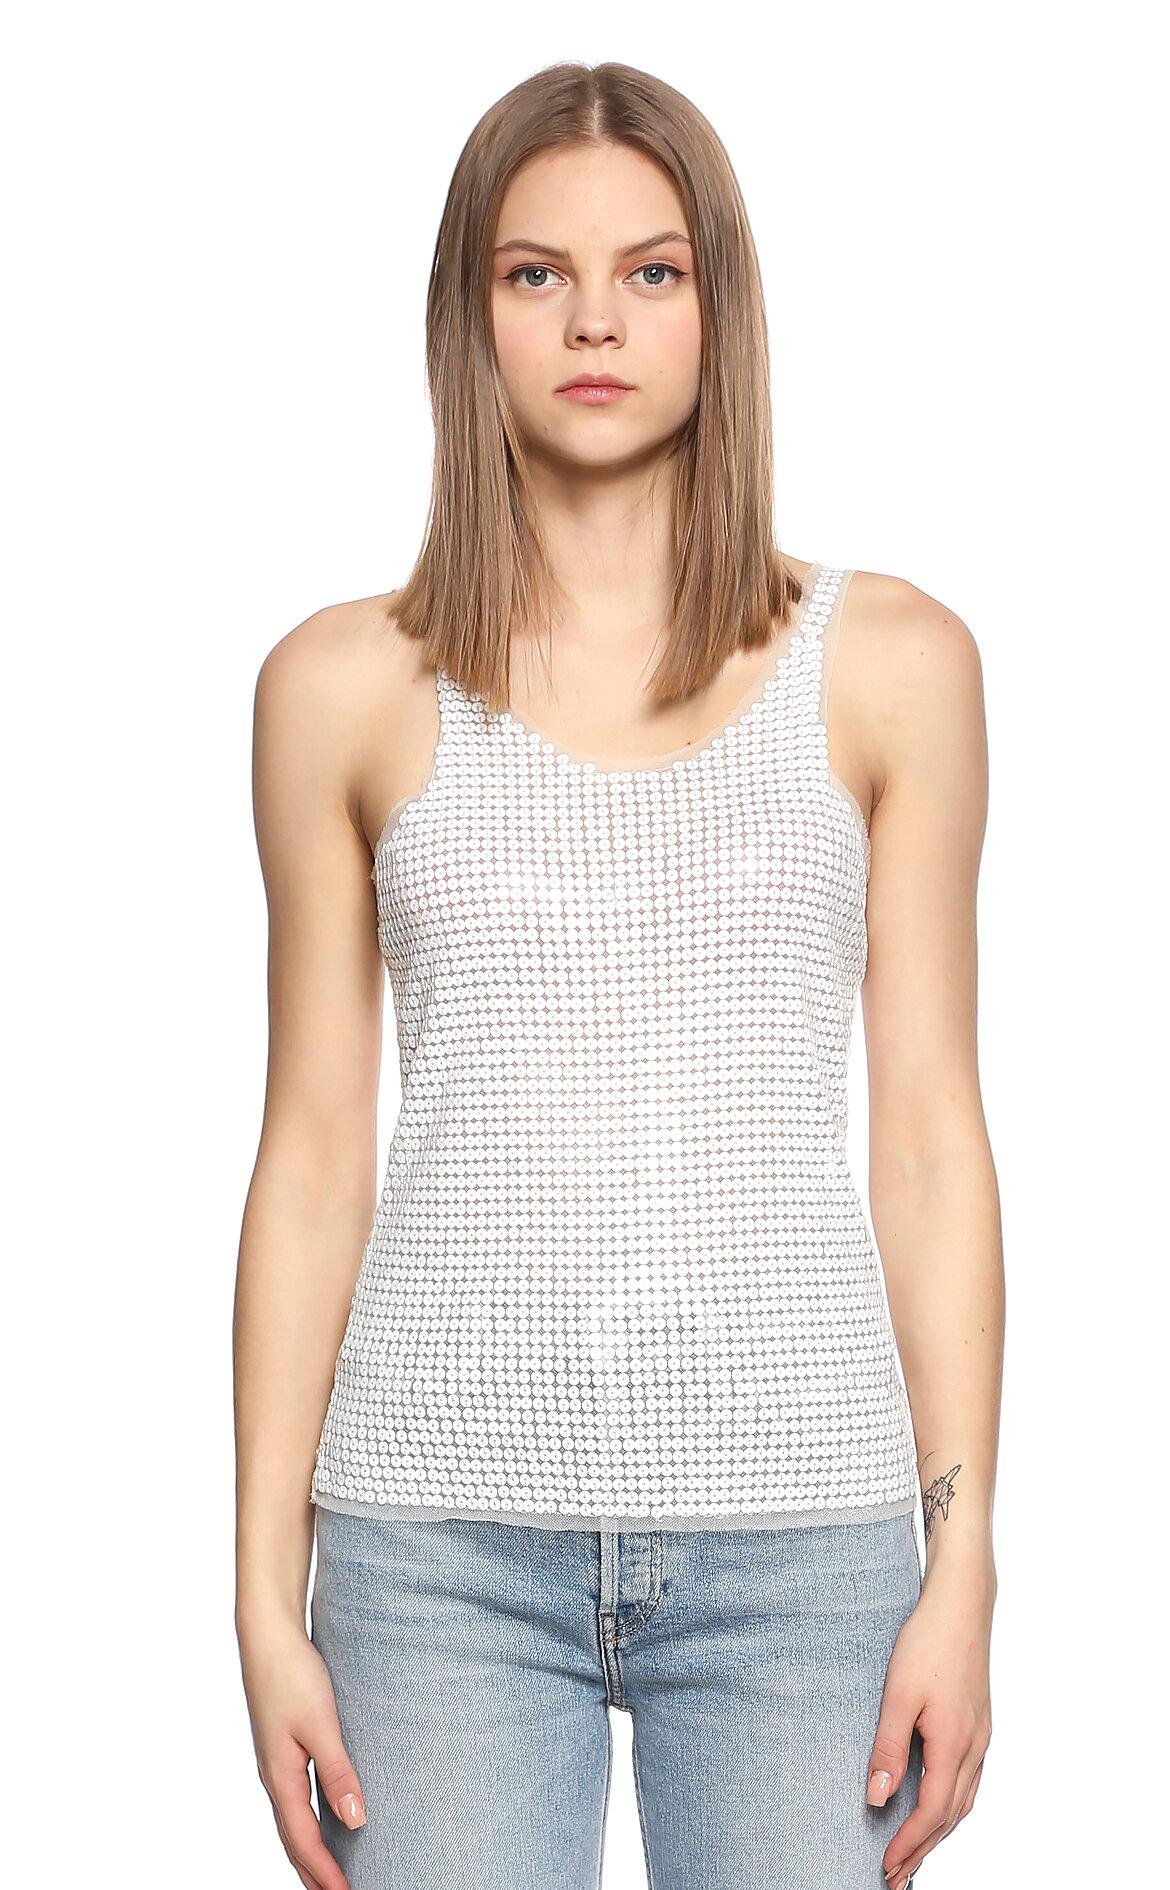 Ltd Jeans-Ltd Jeans Pul Payet Kolsuz Beyaz T-Shirt